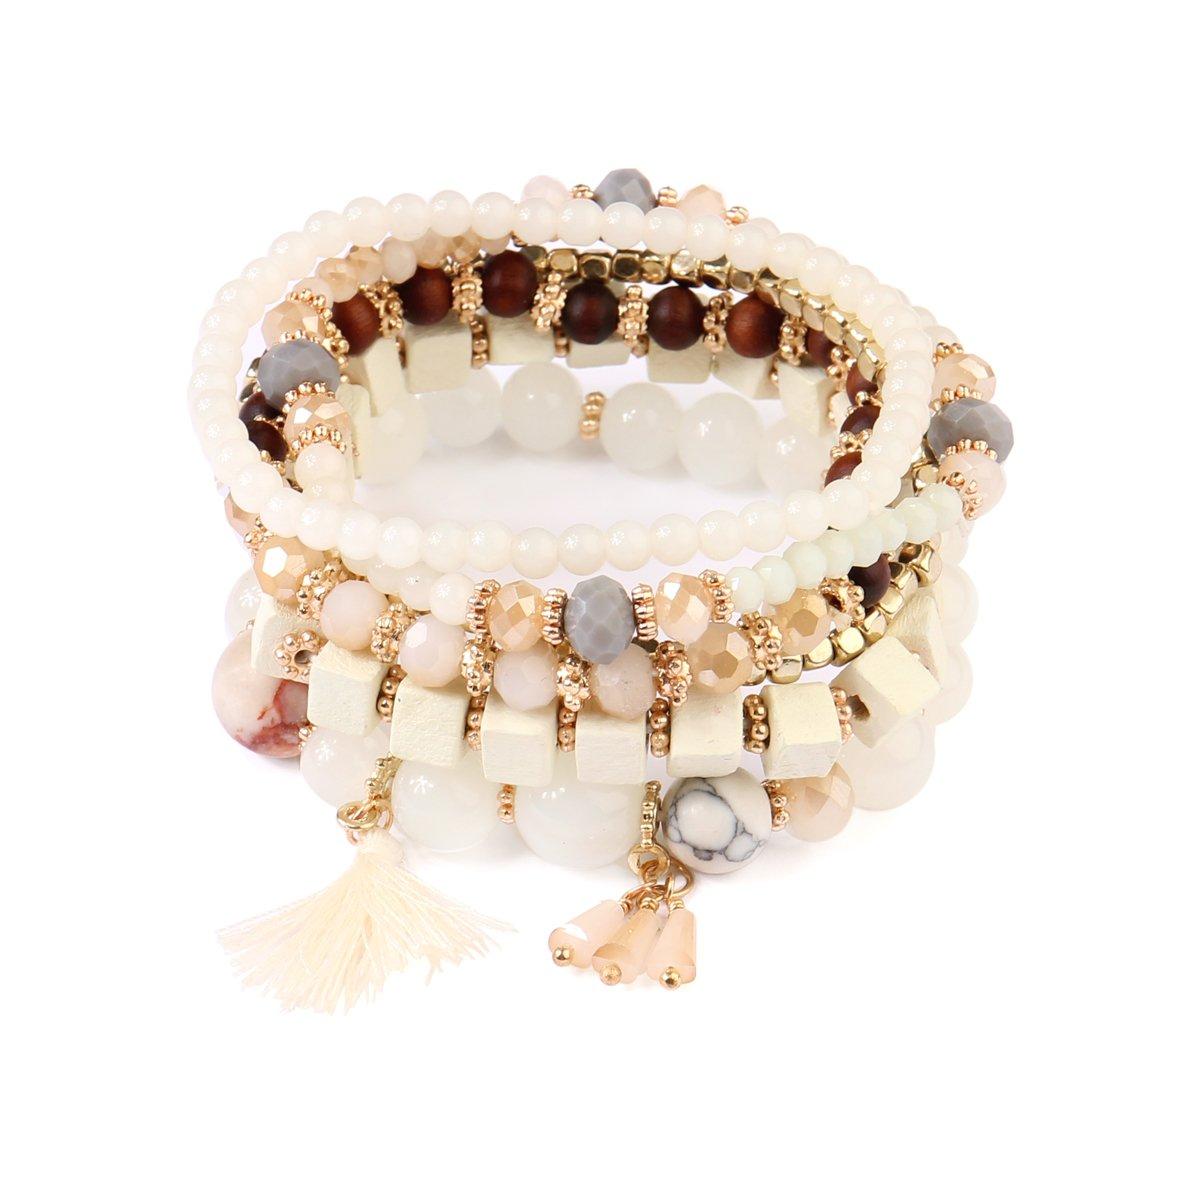 kpajewelry KPA Fashion Women's Wood Multi Bead Tassel Stretch Bracelets - Stackable Beaded Strand Bangles (Natural)